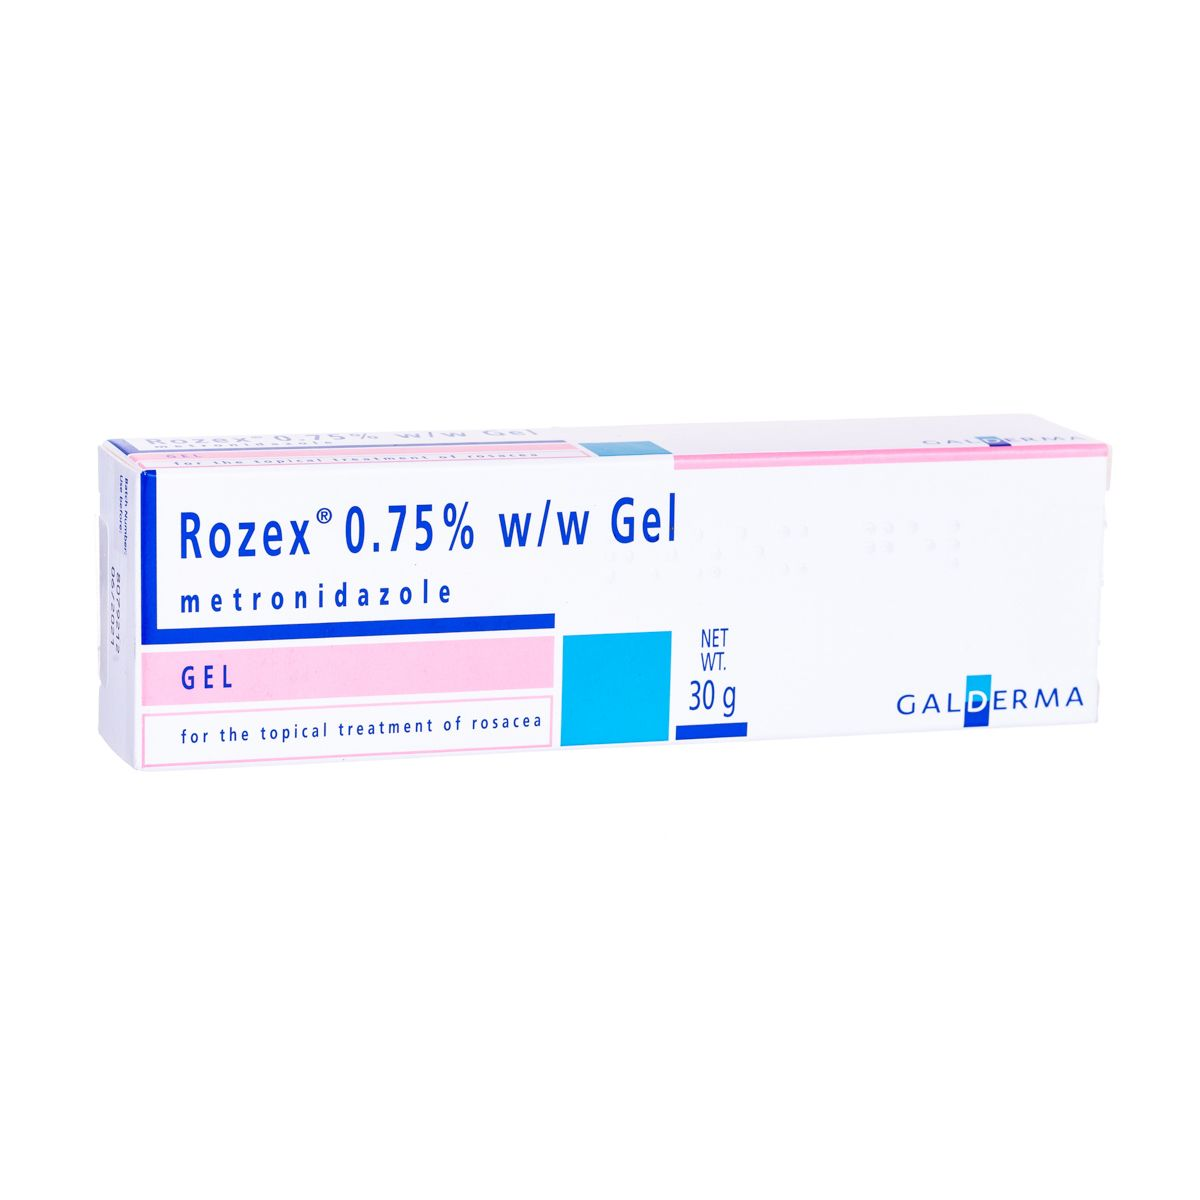 Rozex Gel